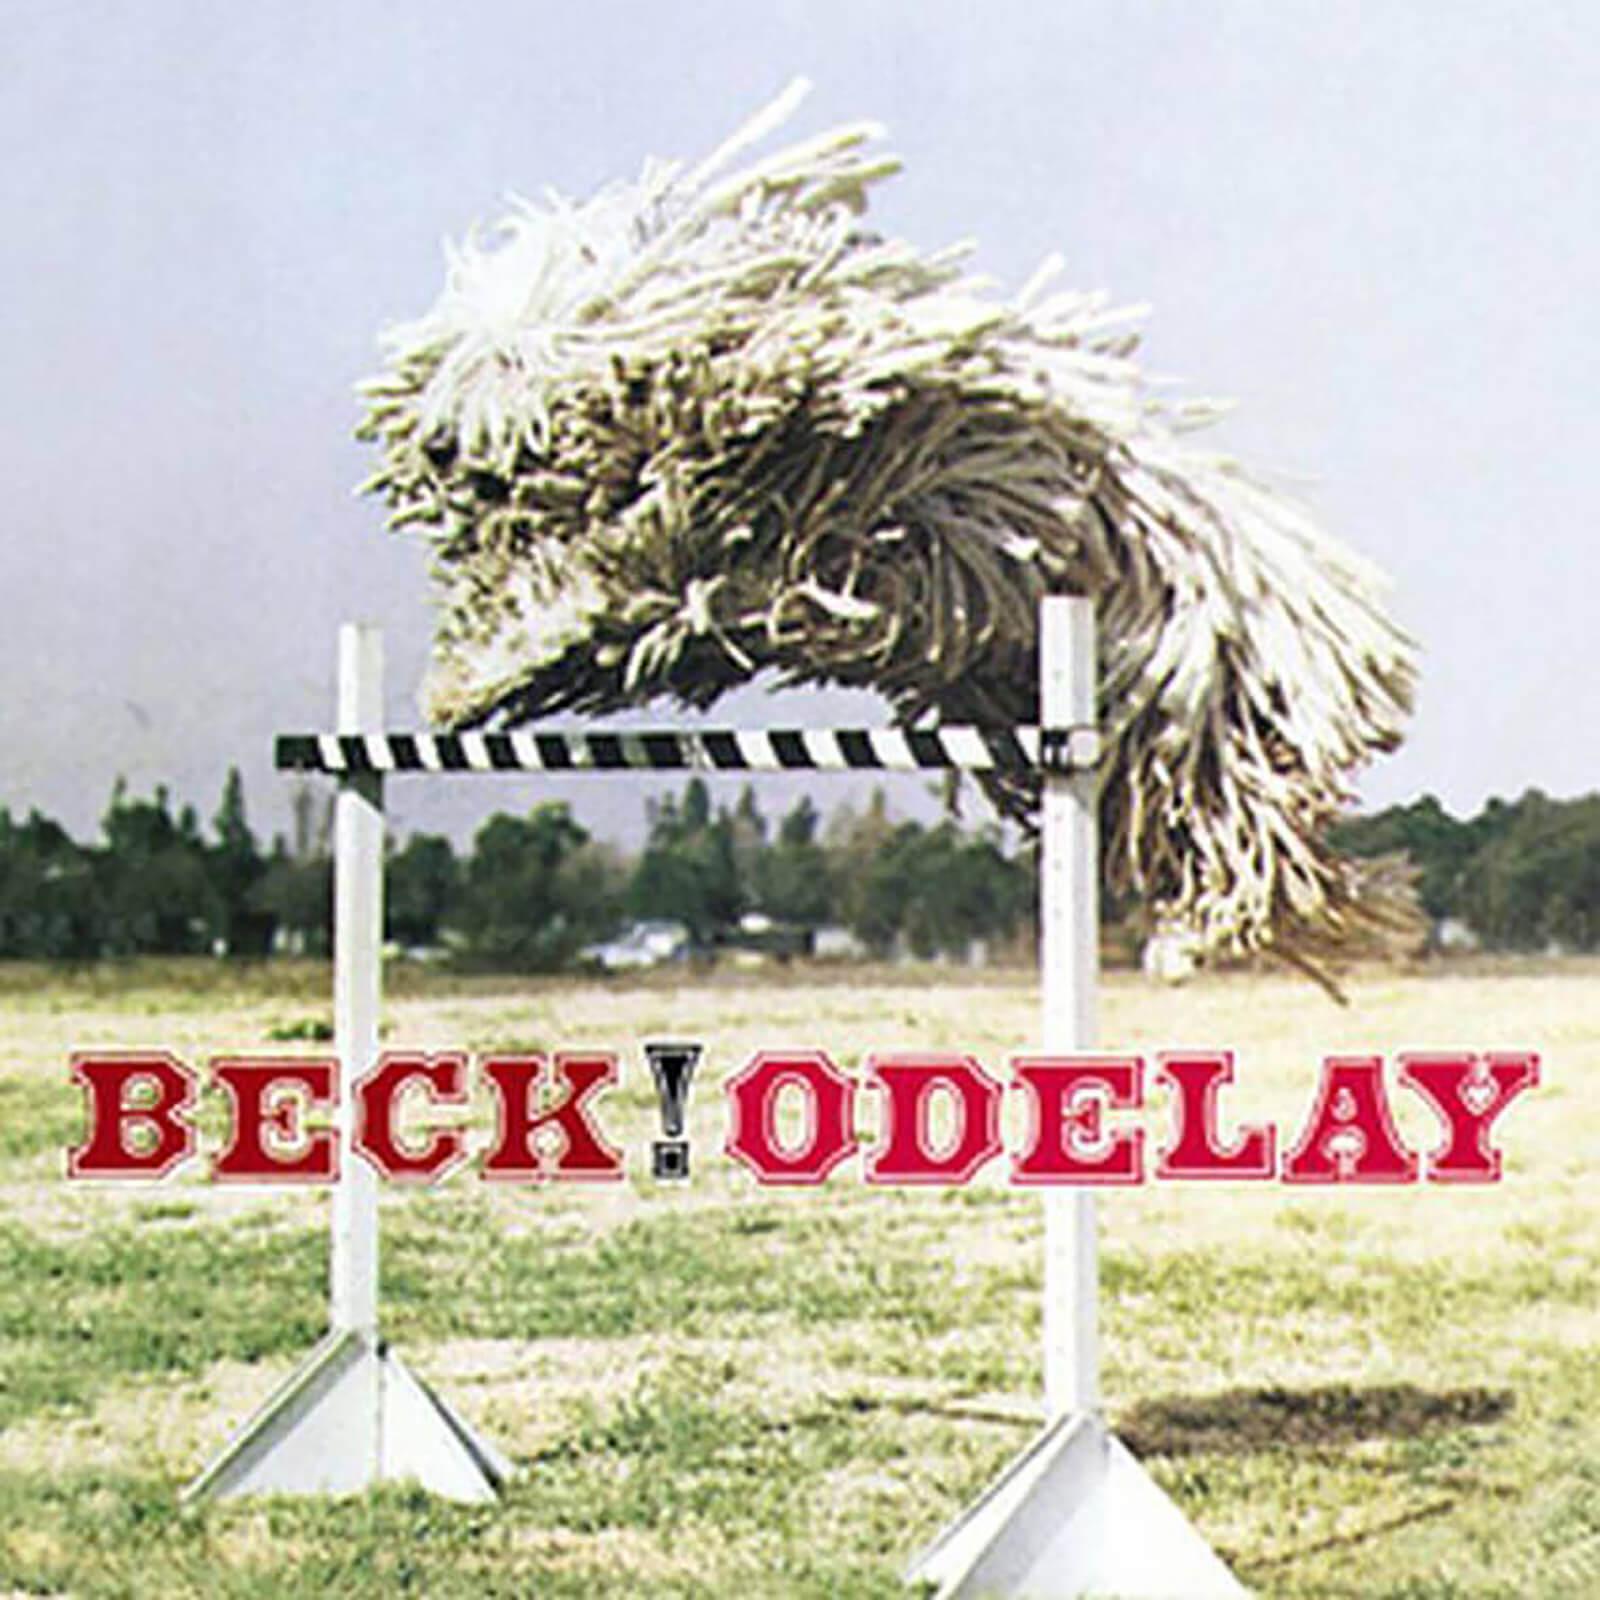 UMC Polydo Beck - Odelay 12 Inch LP